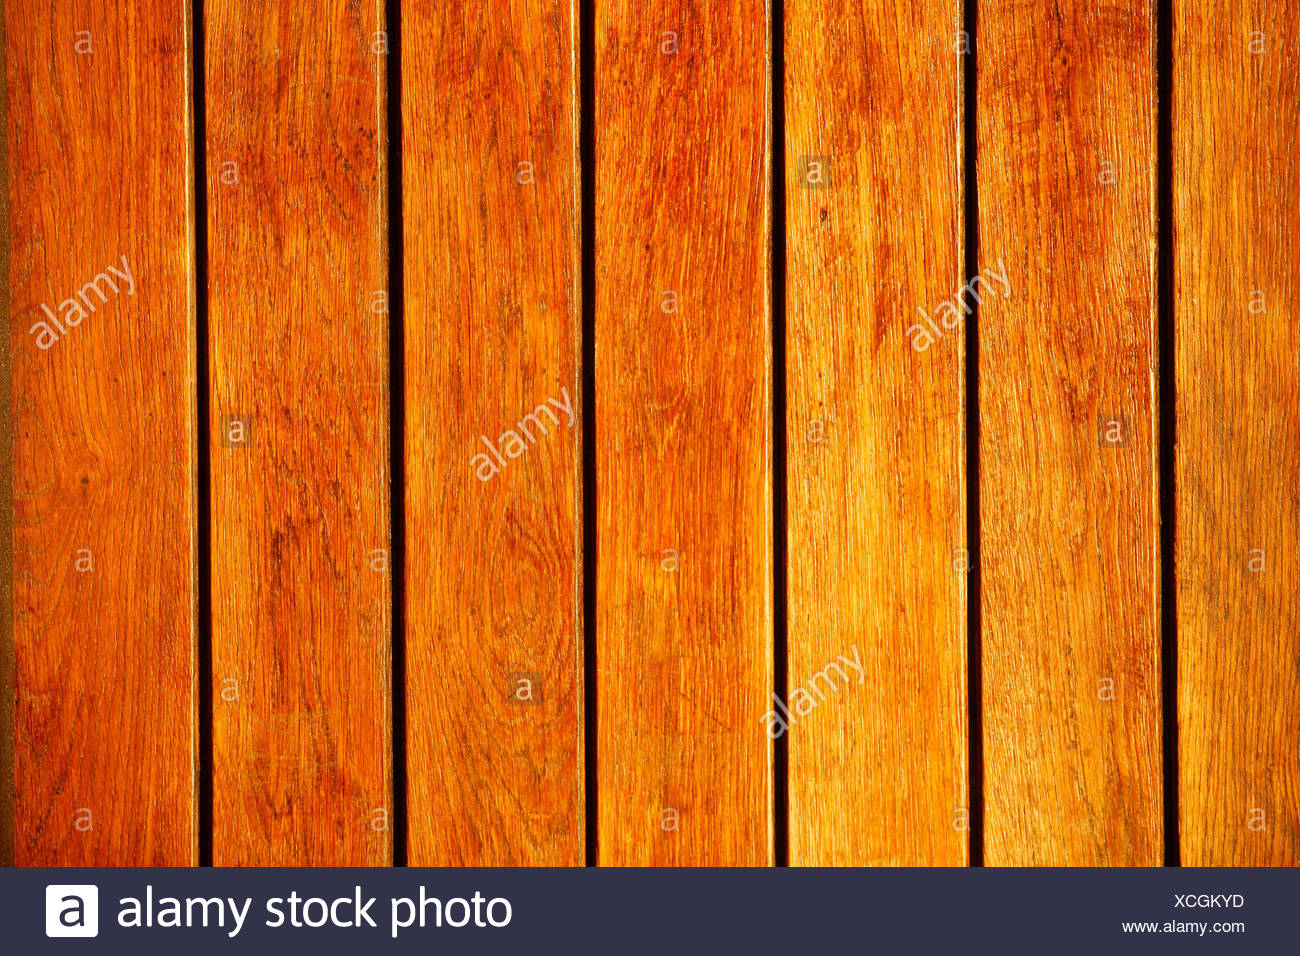 wood columns planks backdrop background board art colour model 1300x956